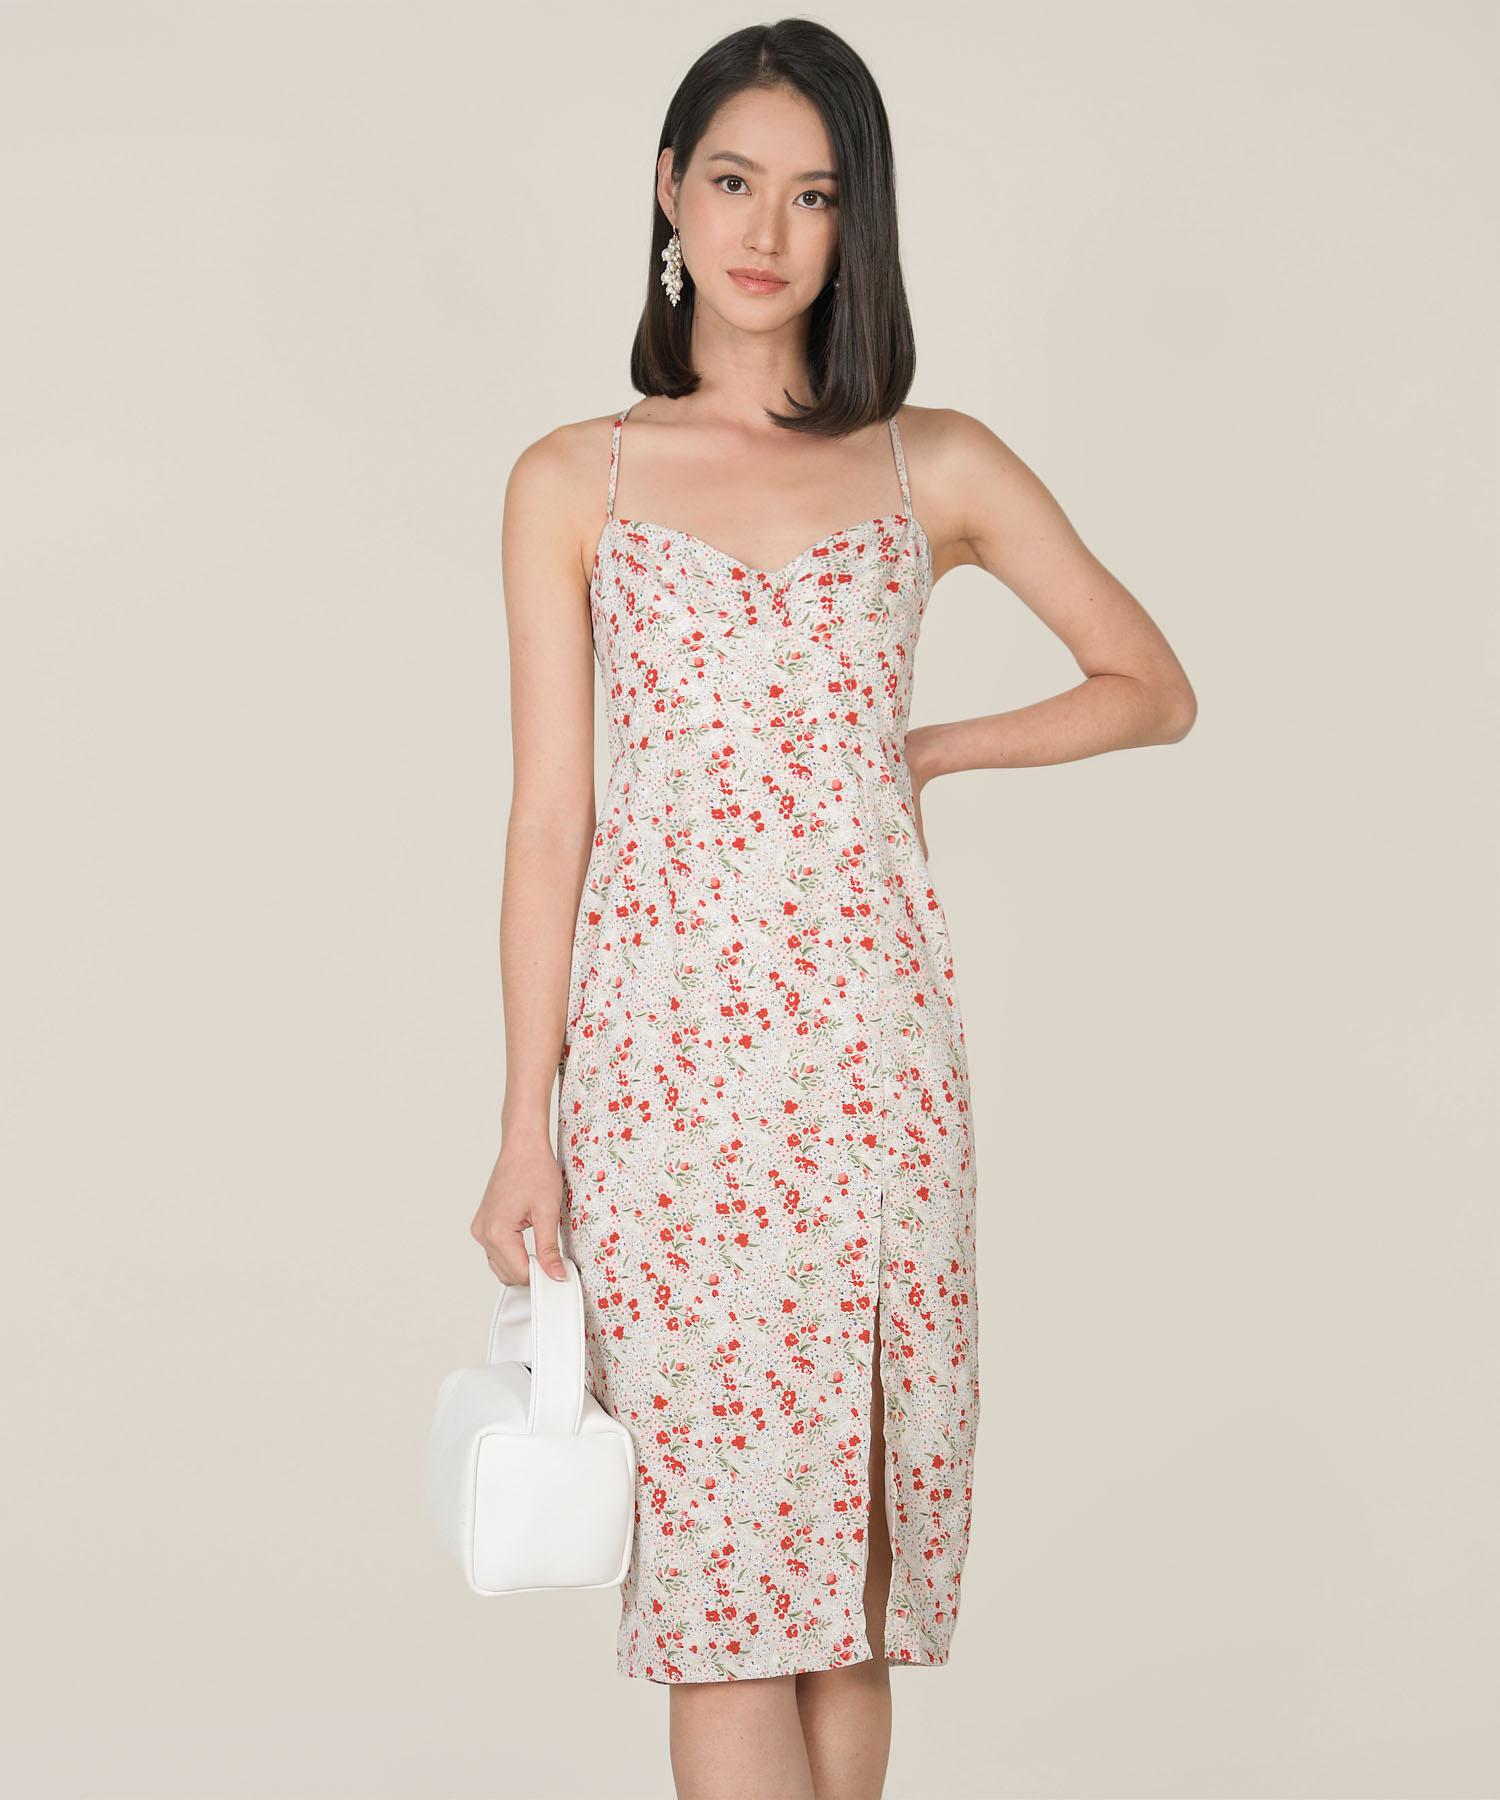 lou-floral-midi-dress-cream-1